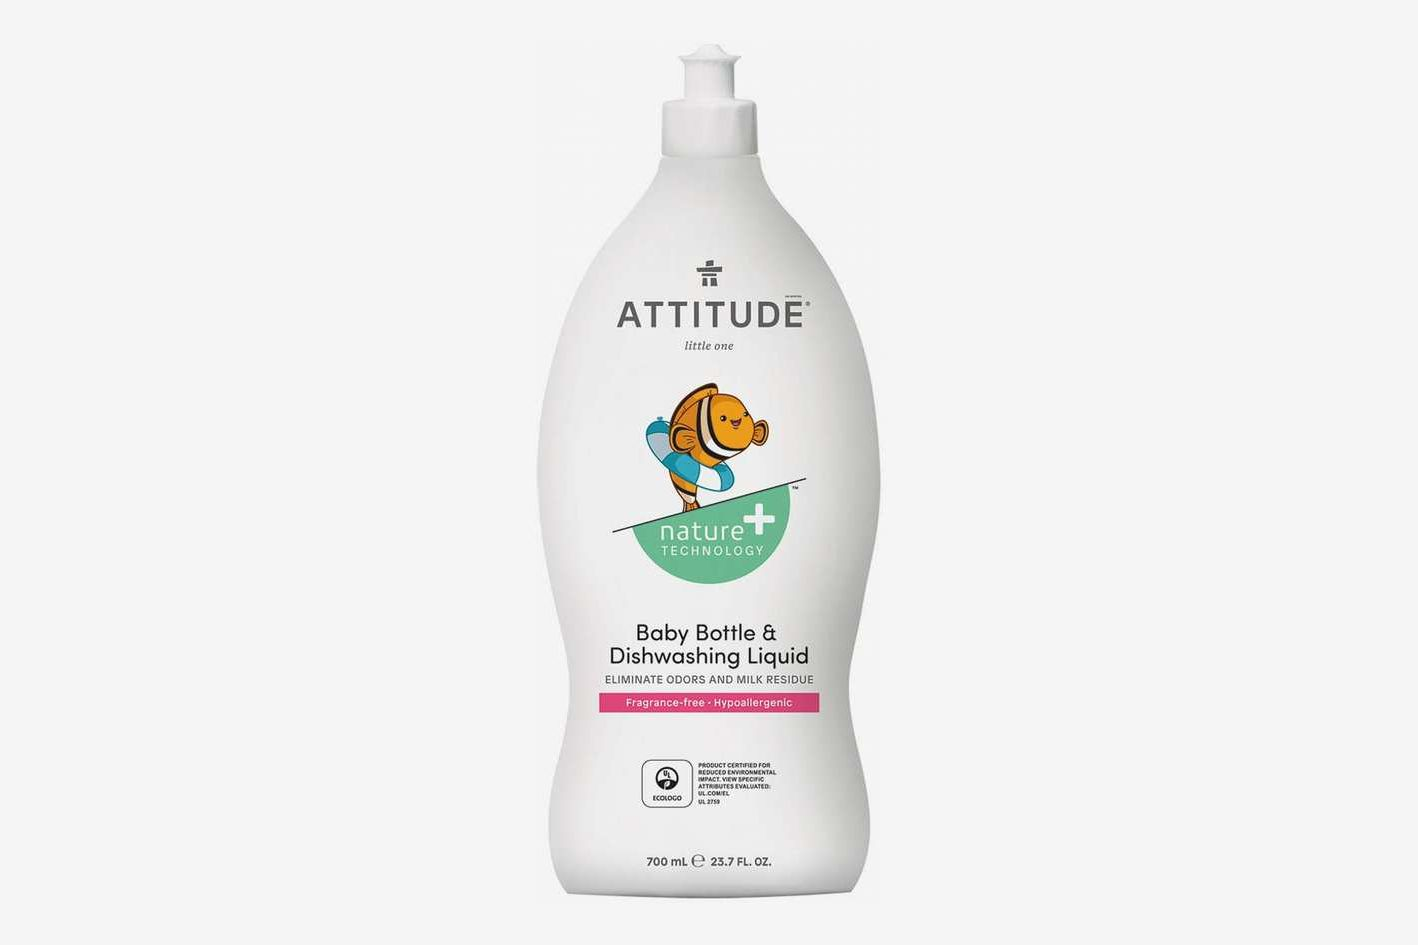 ATTITUDE Nature + Hypoallergenic Baby Bottle and Dishwashing Liquid